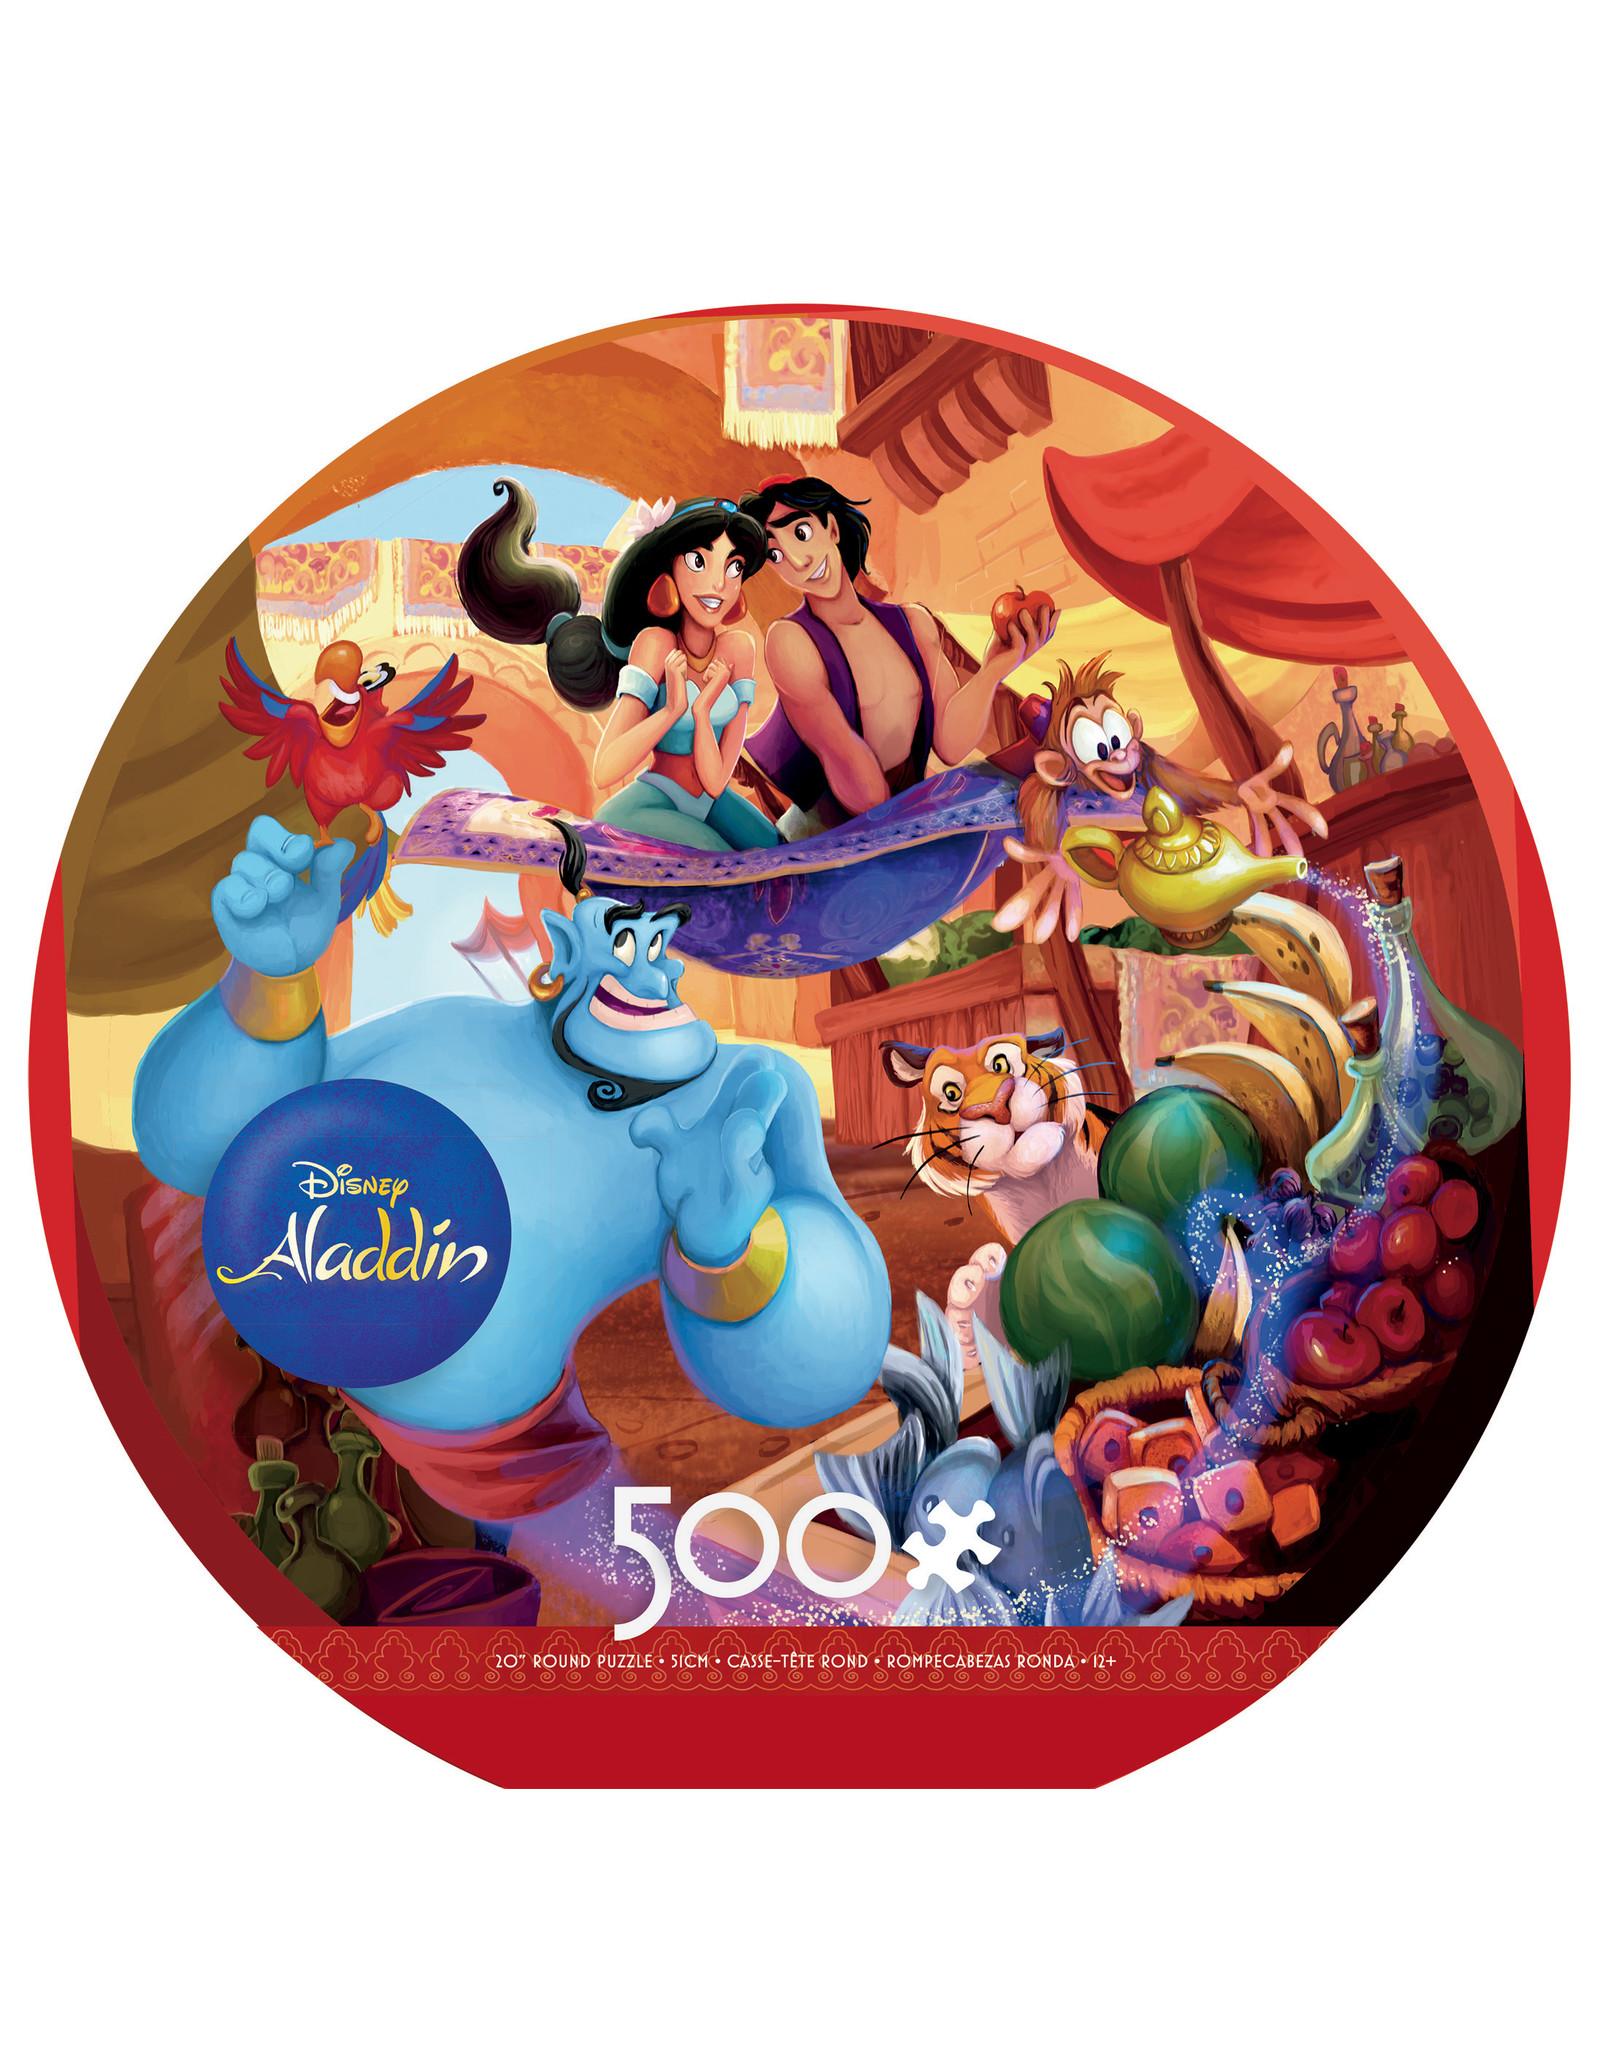 "Ceaco Disney: ""Aladdin"" 500 Piece Round Puzzle"